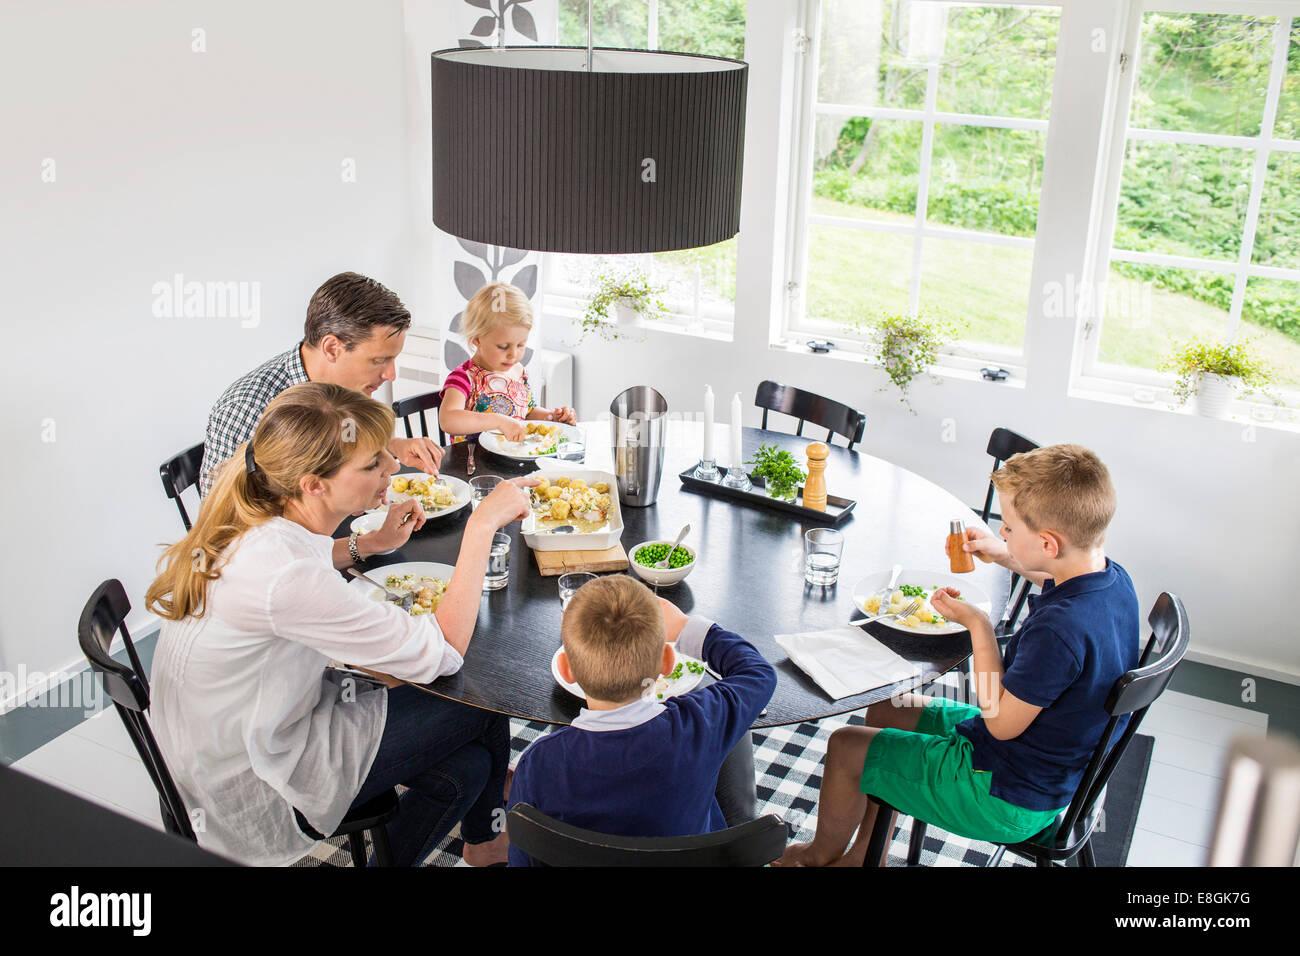 Almorzando en casa de familia Imagen De Stock